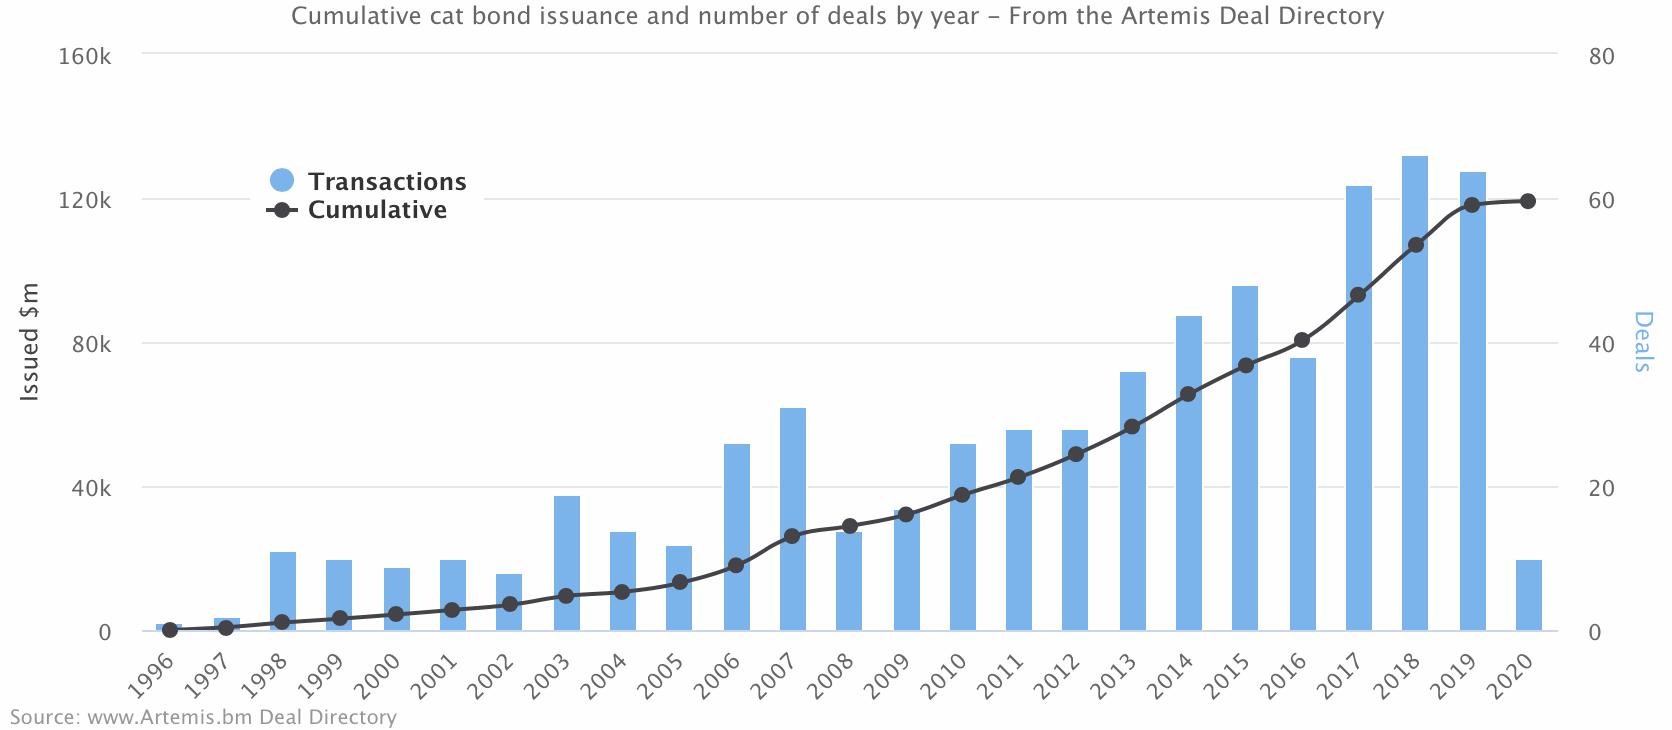 catastrophe-bond-issuance-cumulative